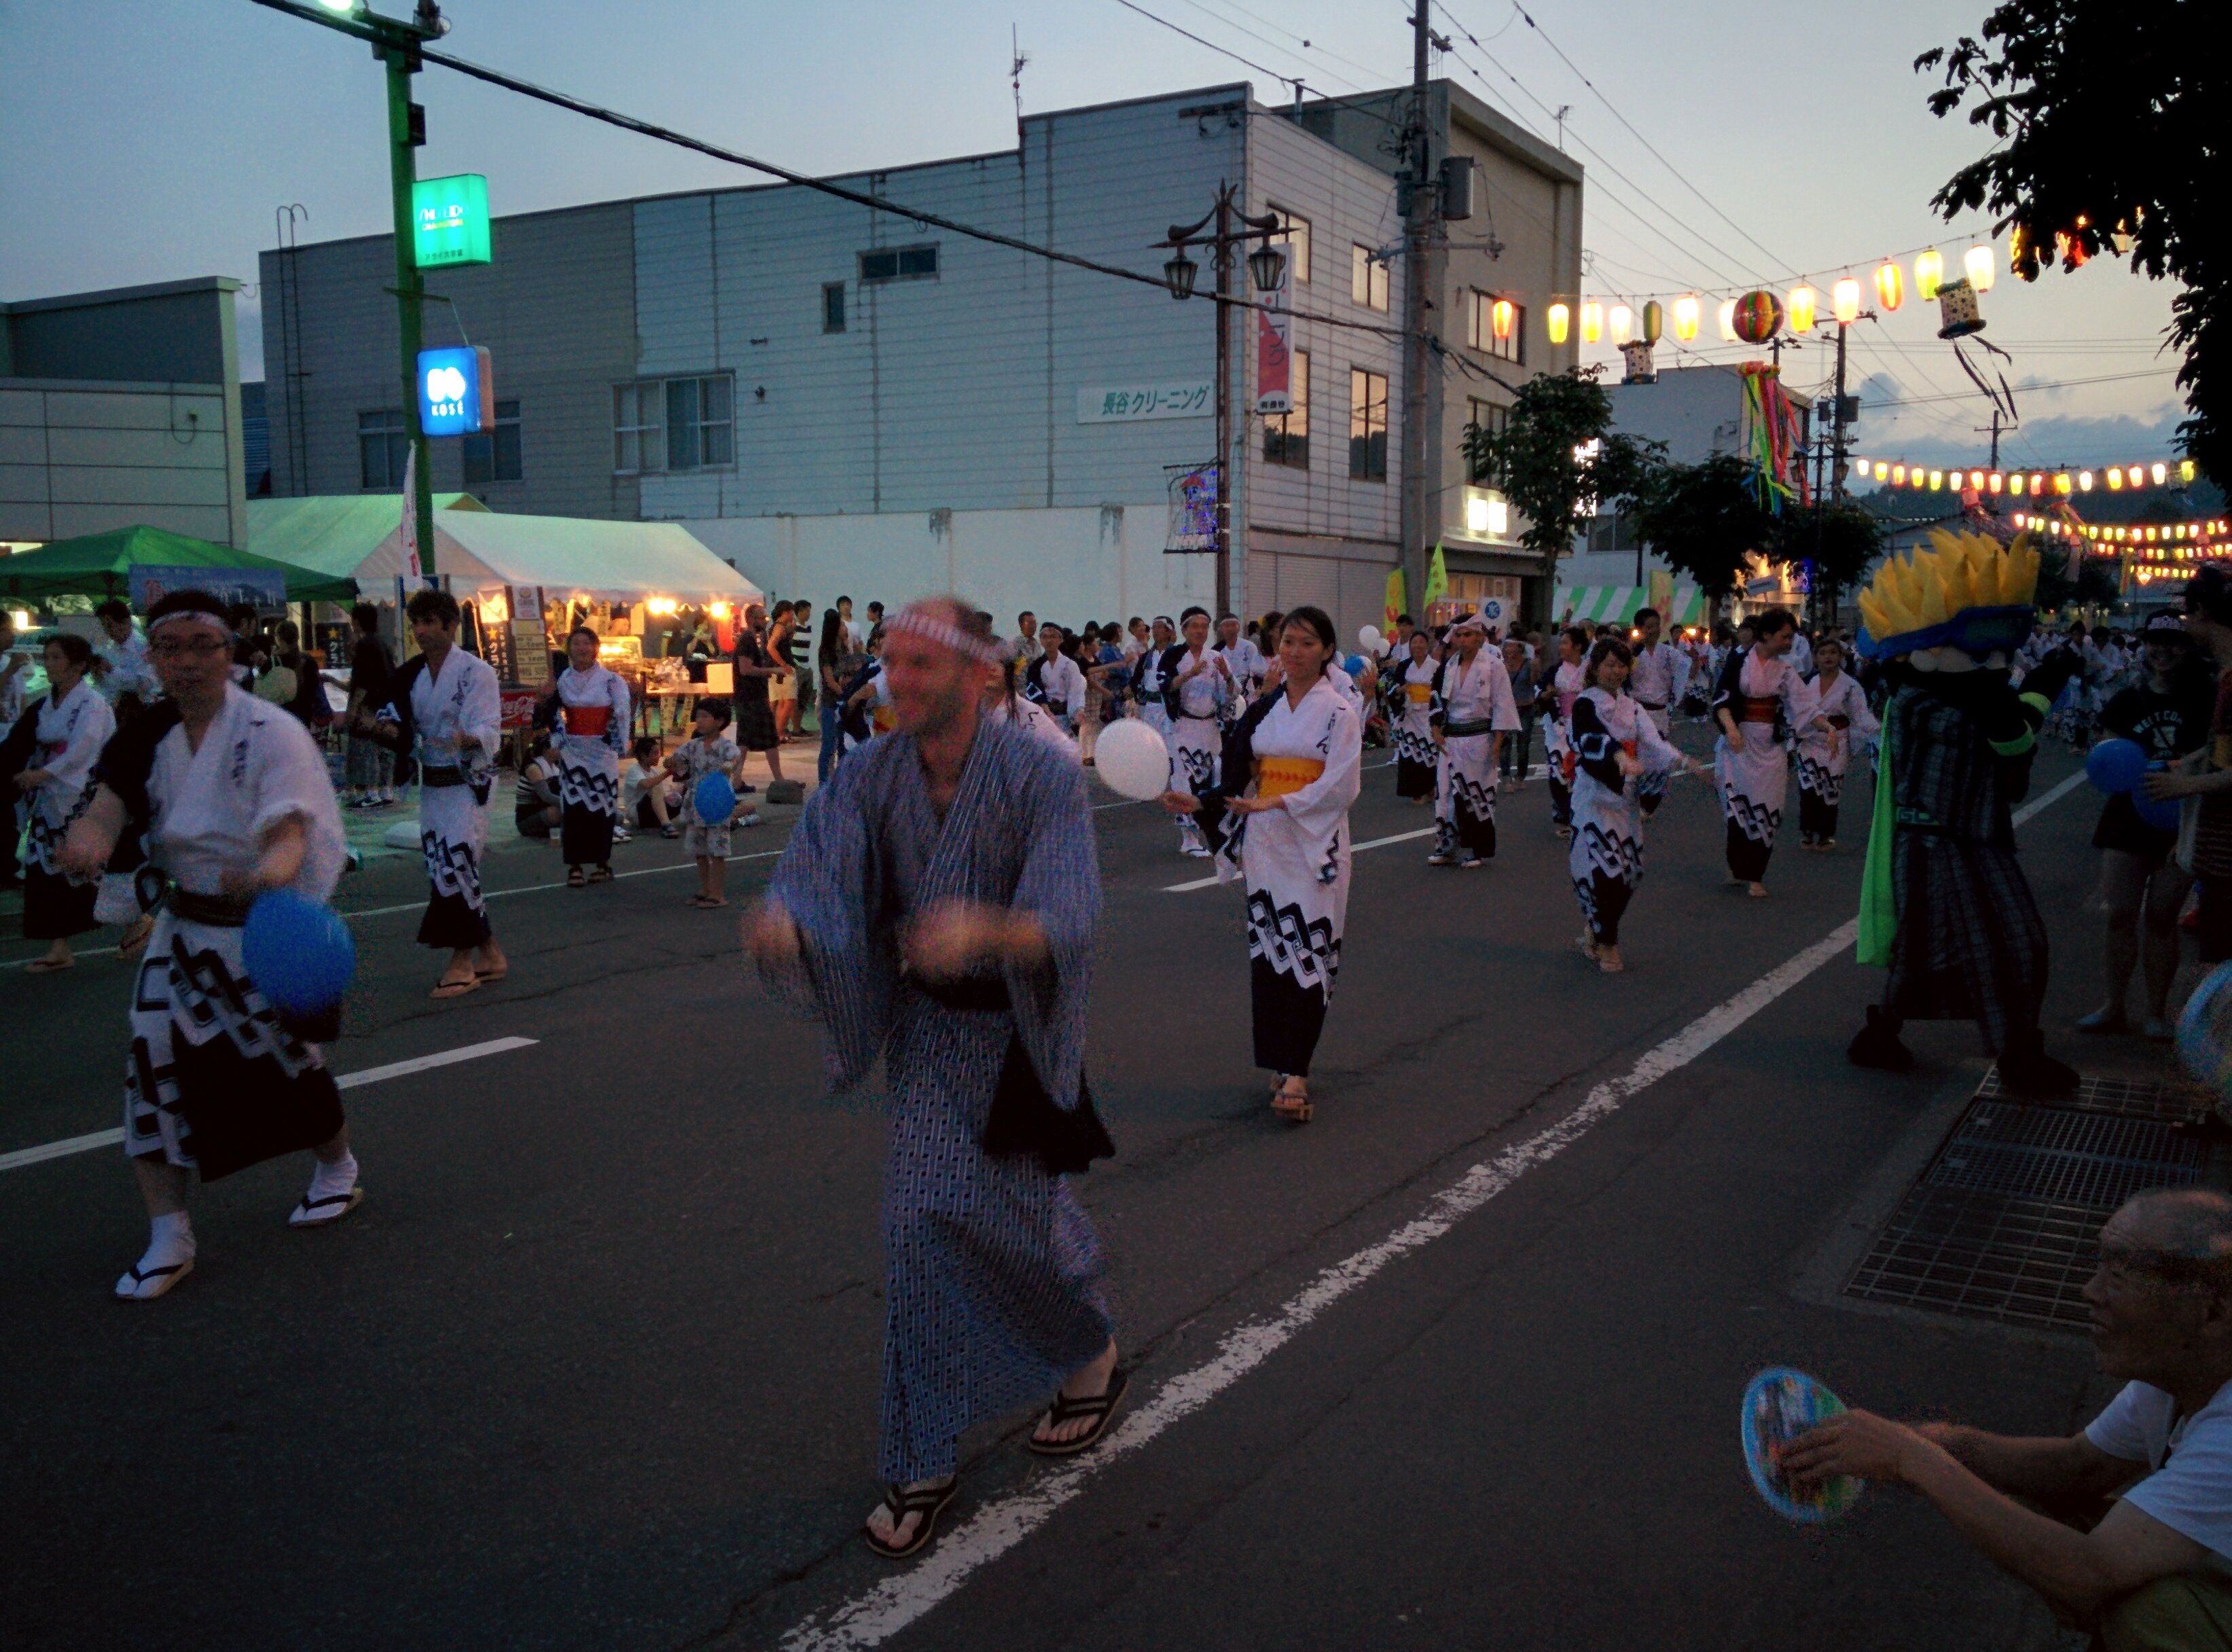 Kutchan Jaga Matsuri Parade